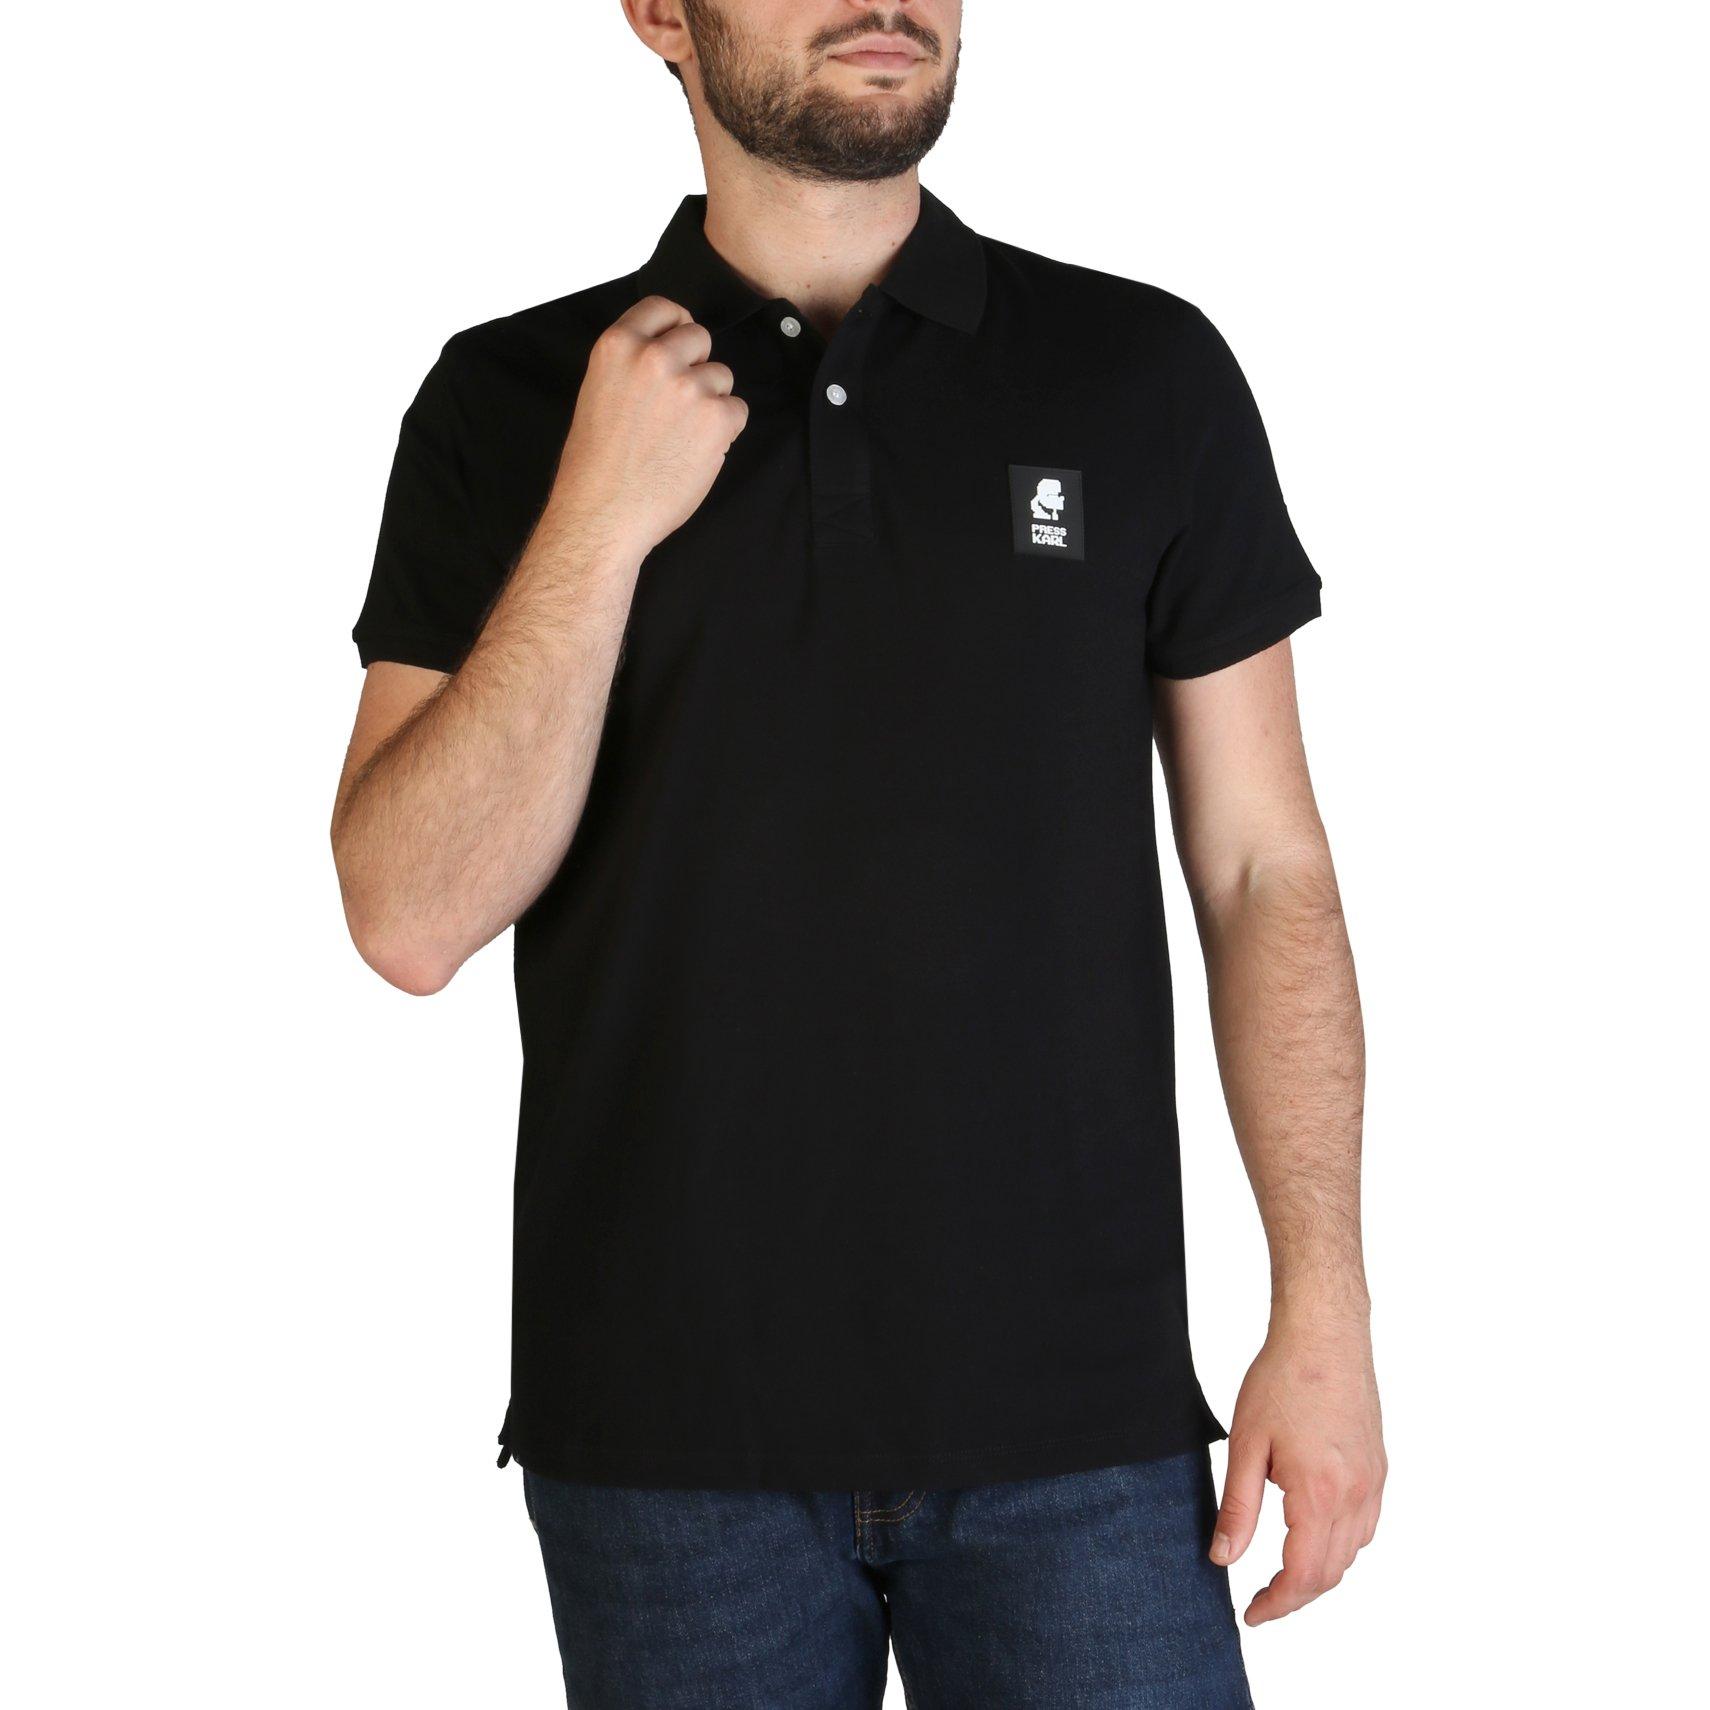 Karl Lagerfeld Men's Polo Shirt Various Colours KL21MPL01 - black M